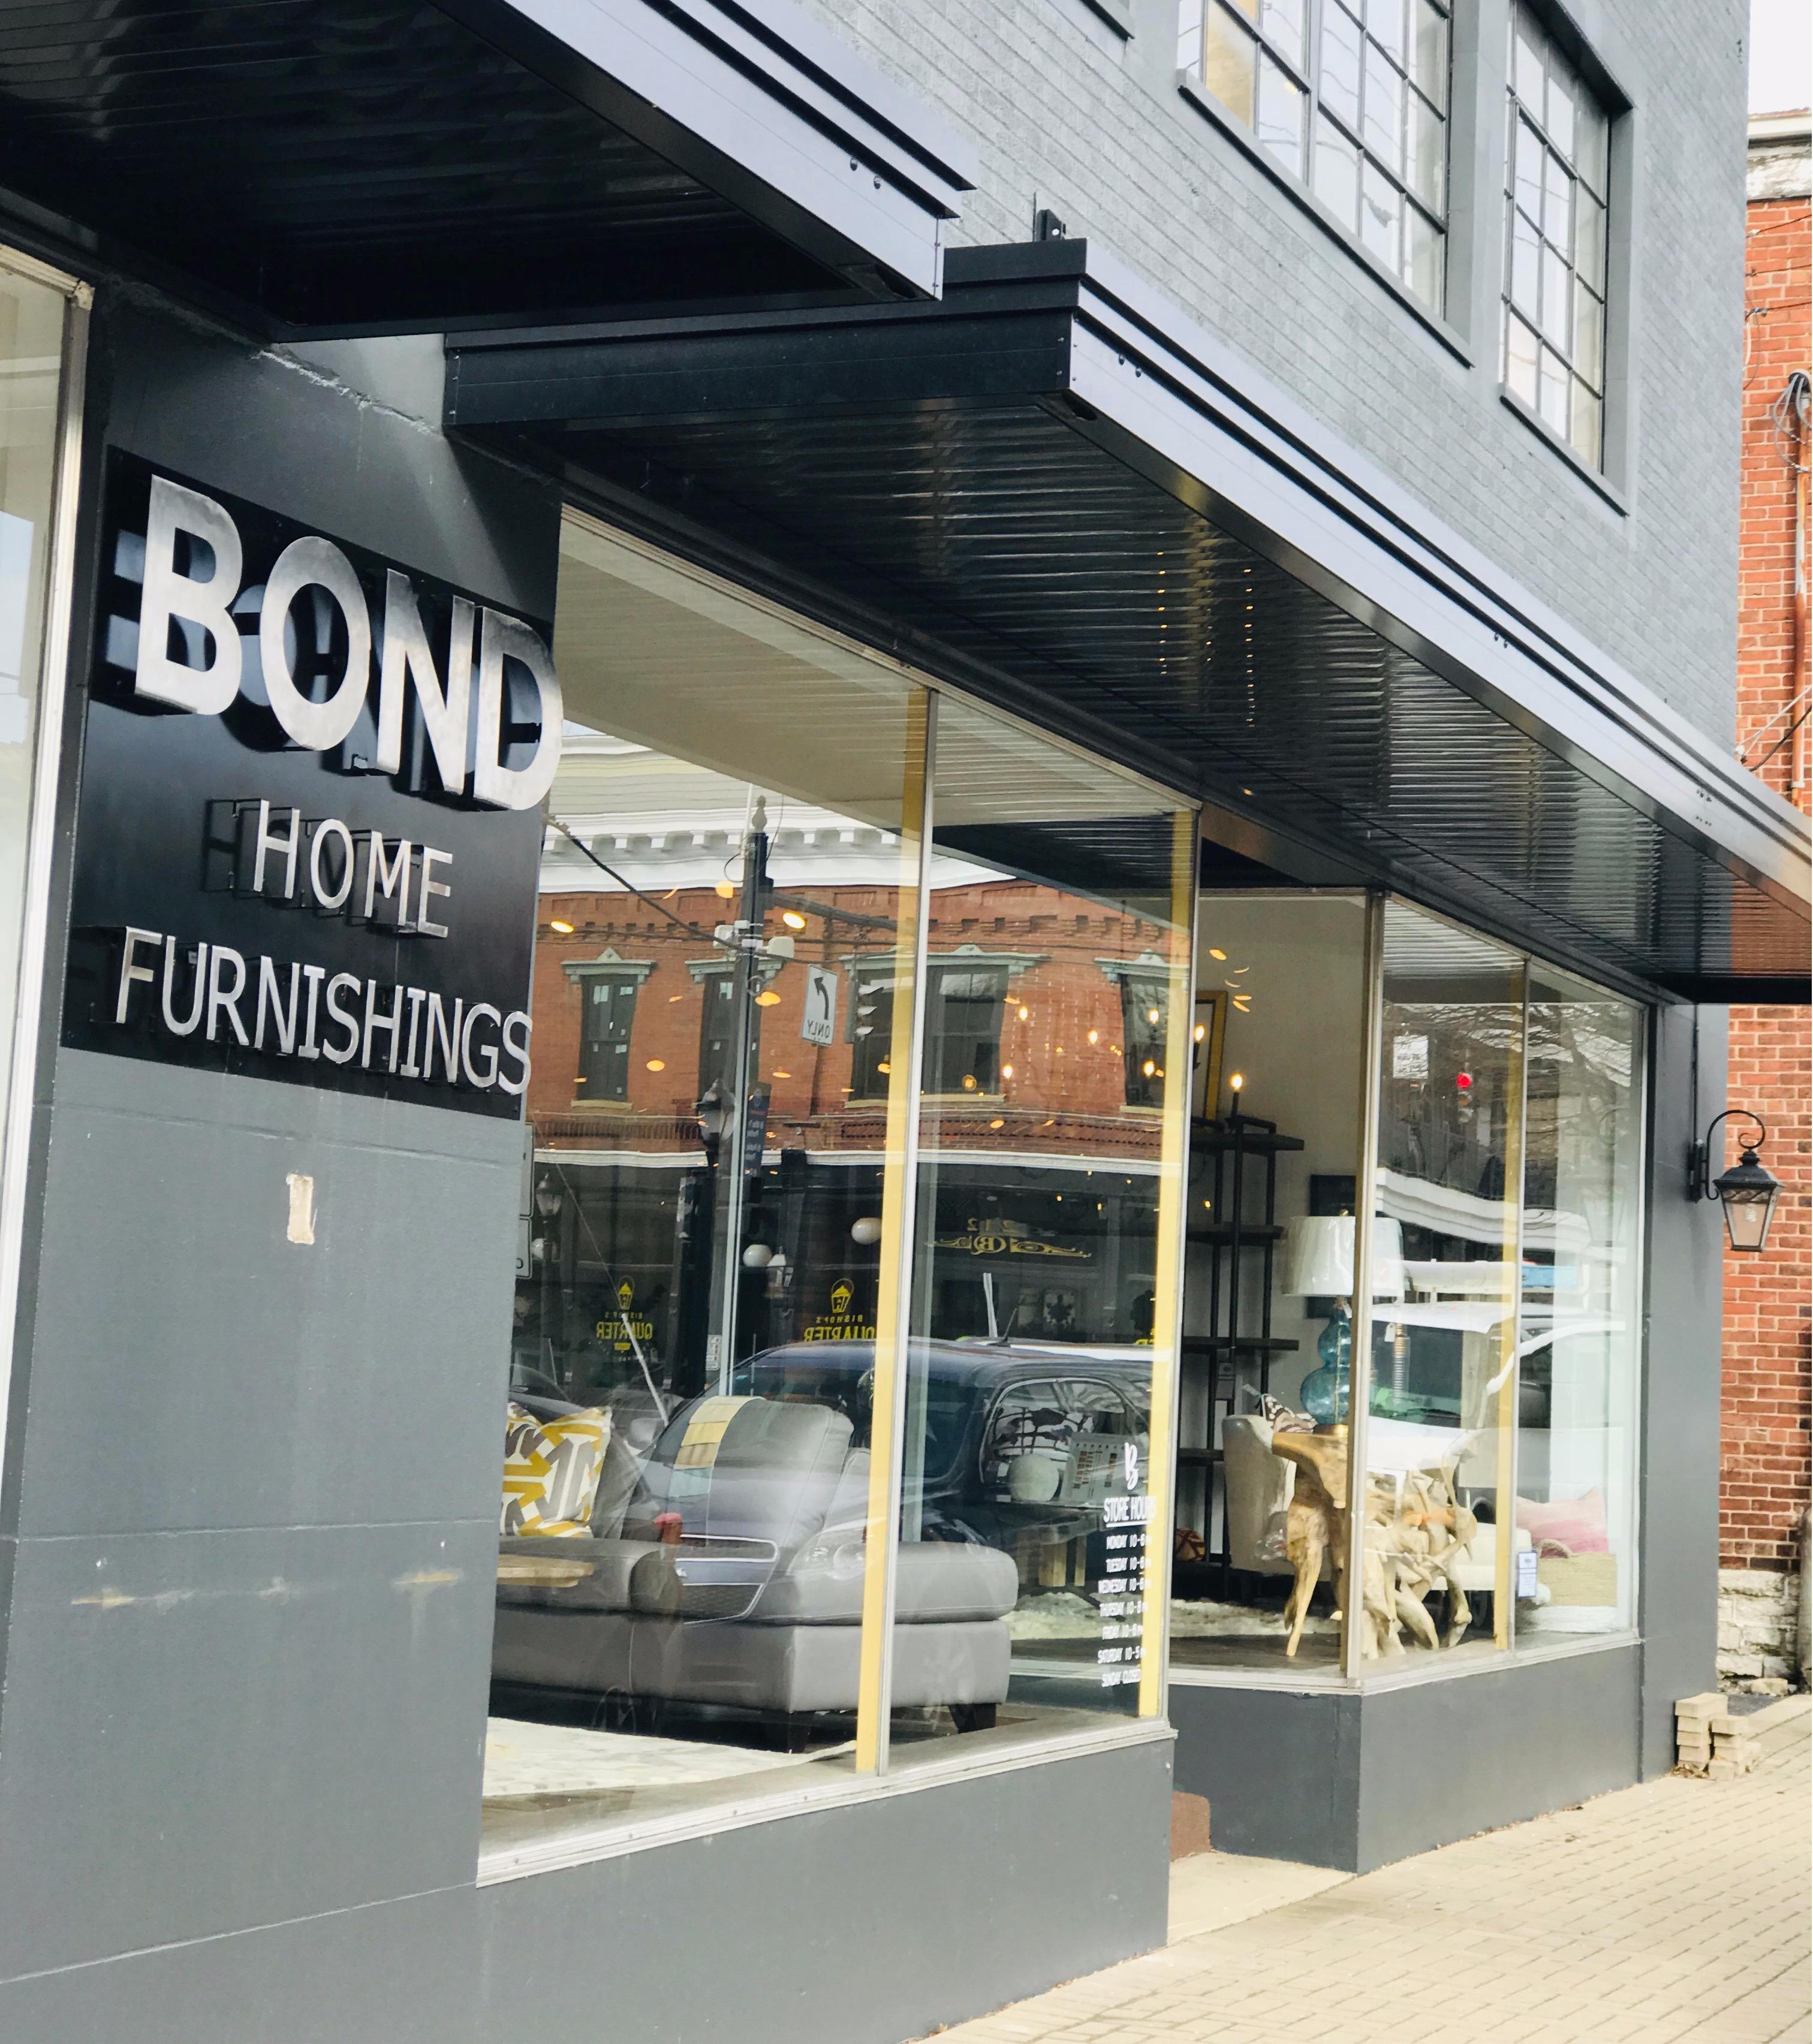 Bond Furniture and Design